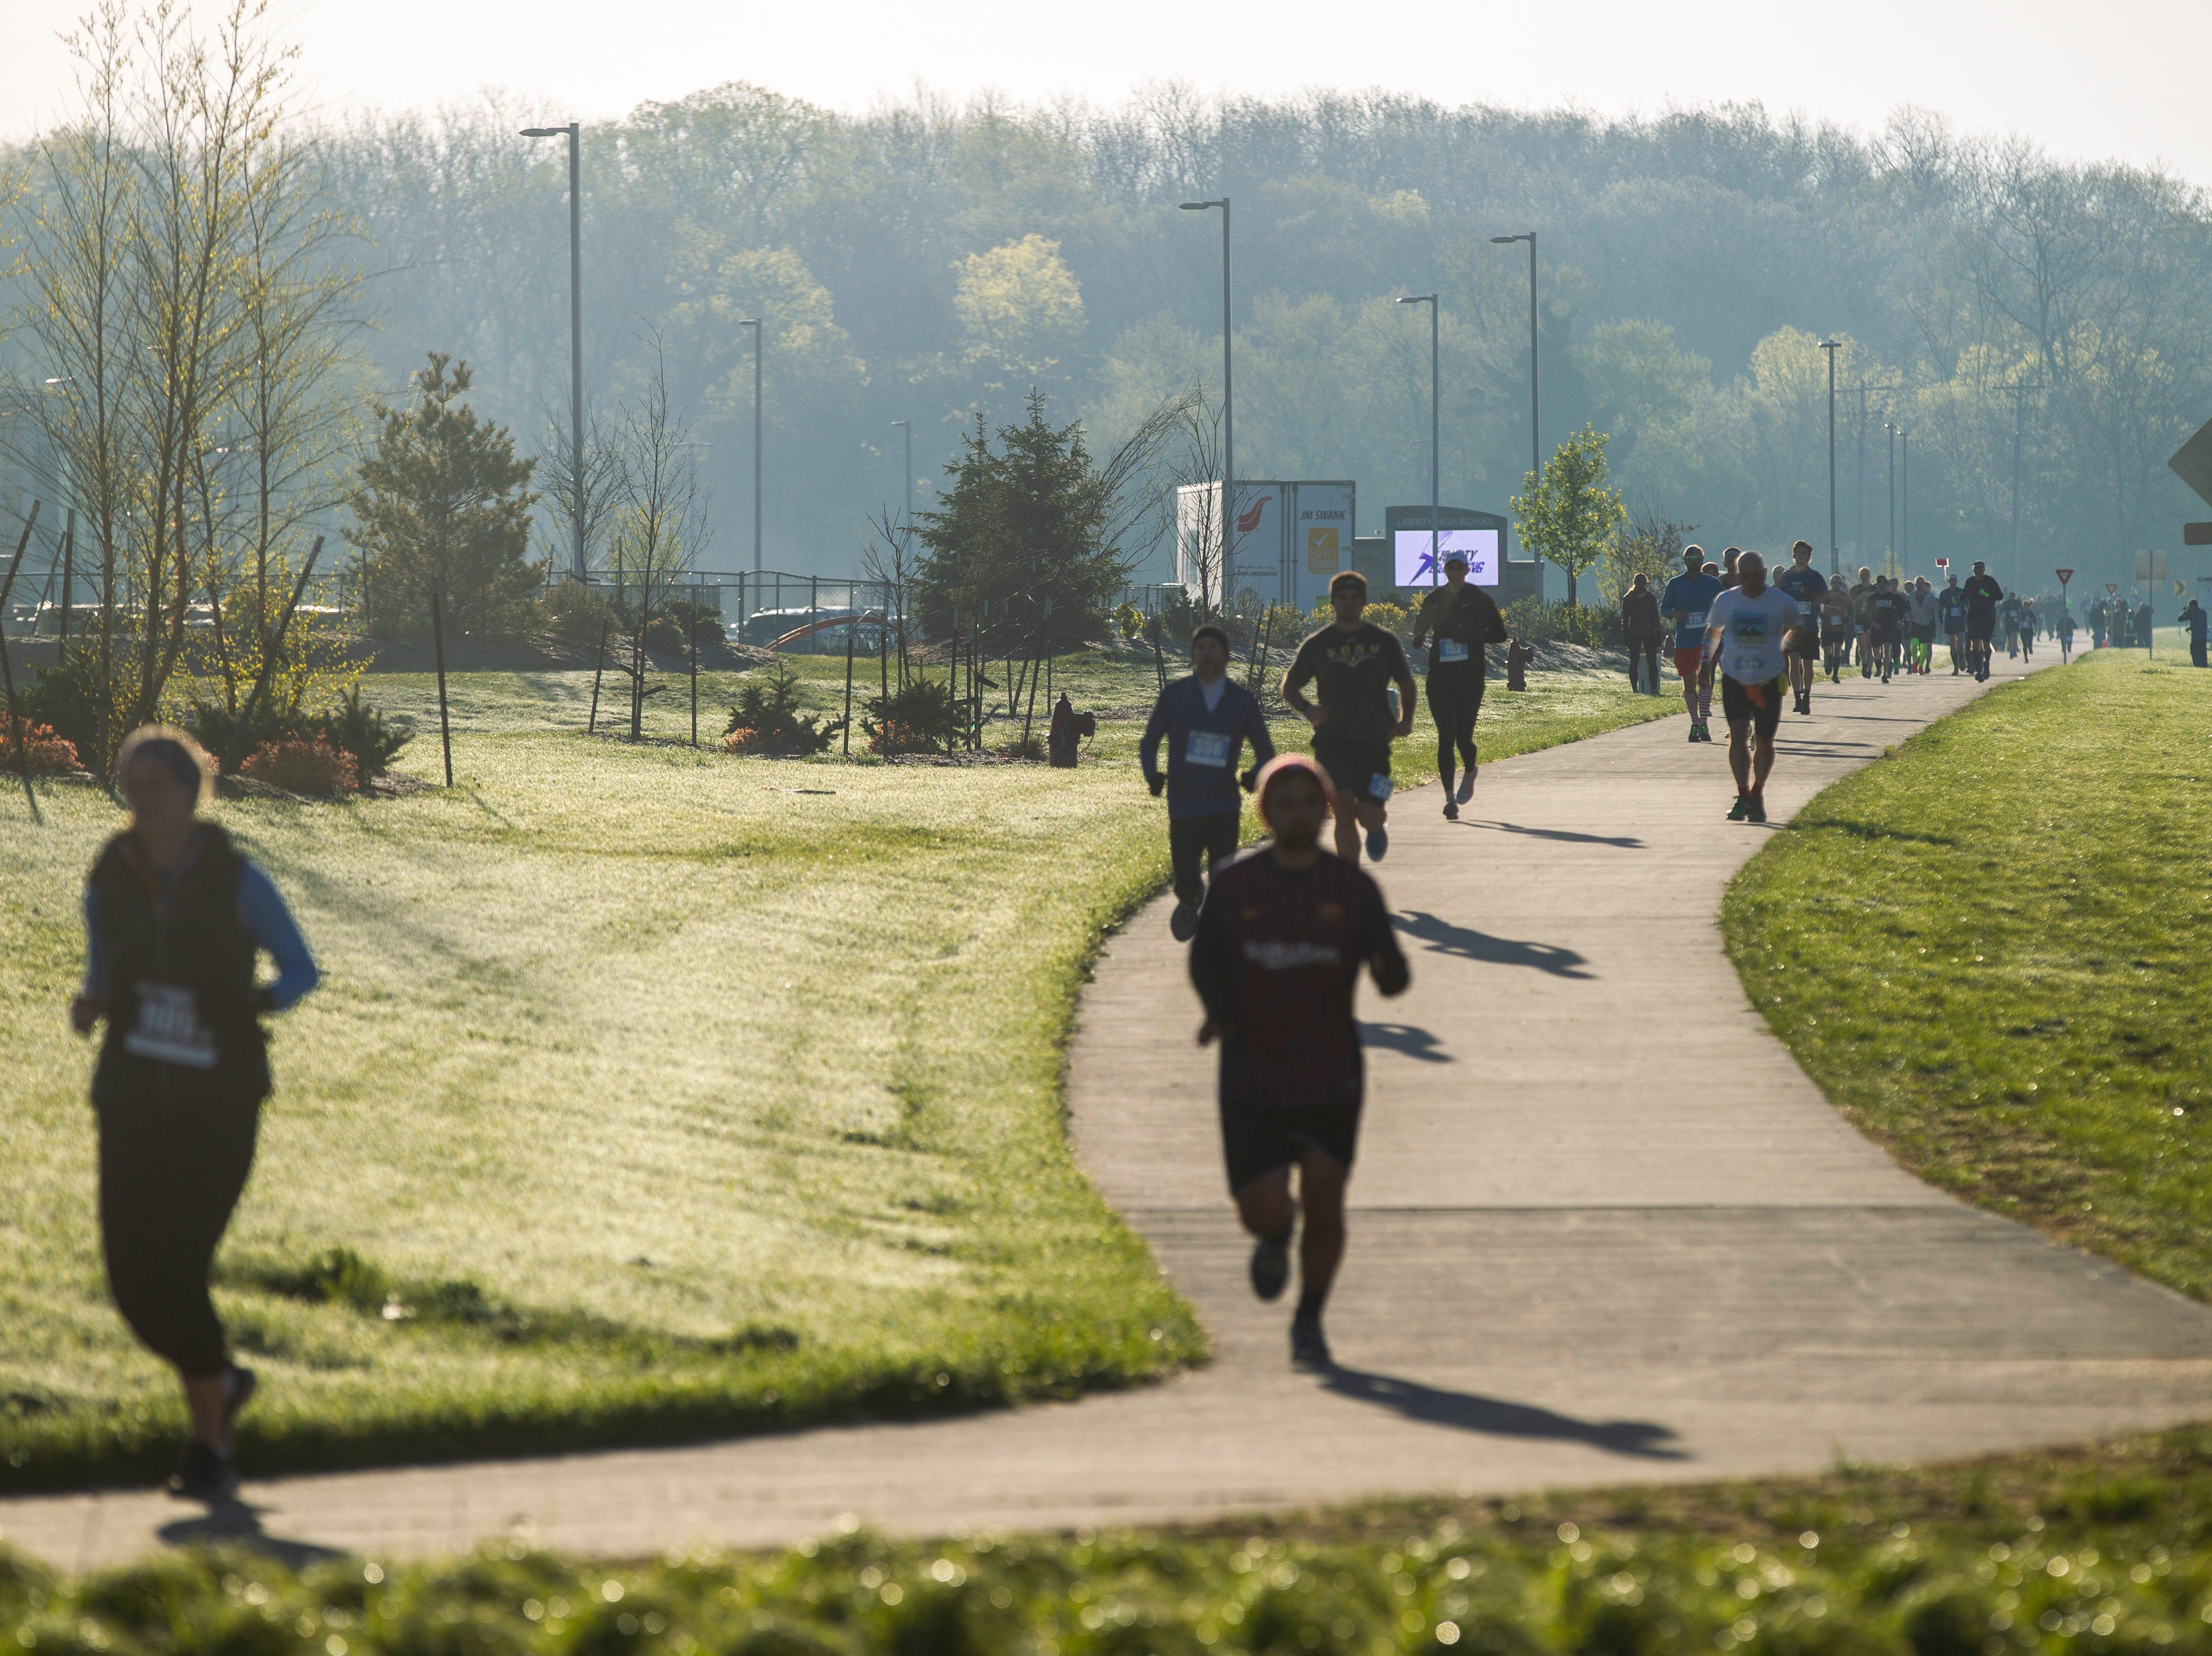 Runners pass Liberty High School during the second annual Run CRANDIC marathon, Sunday, April 28, 2019, along Dubuque Street in North Liberty, Iowa.